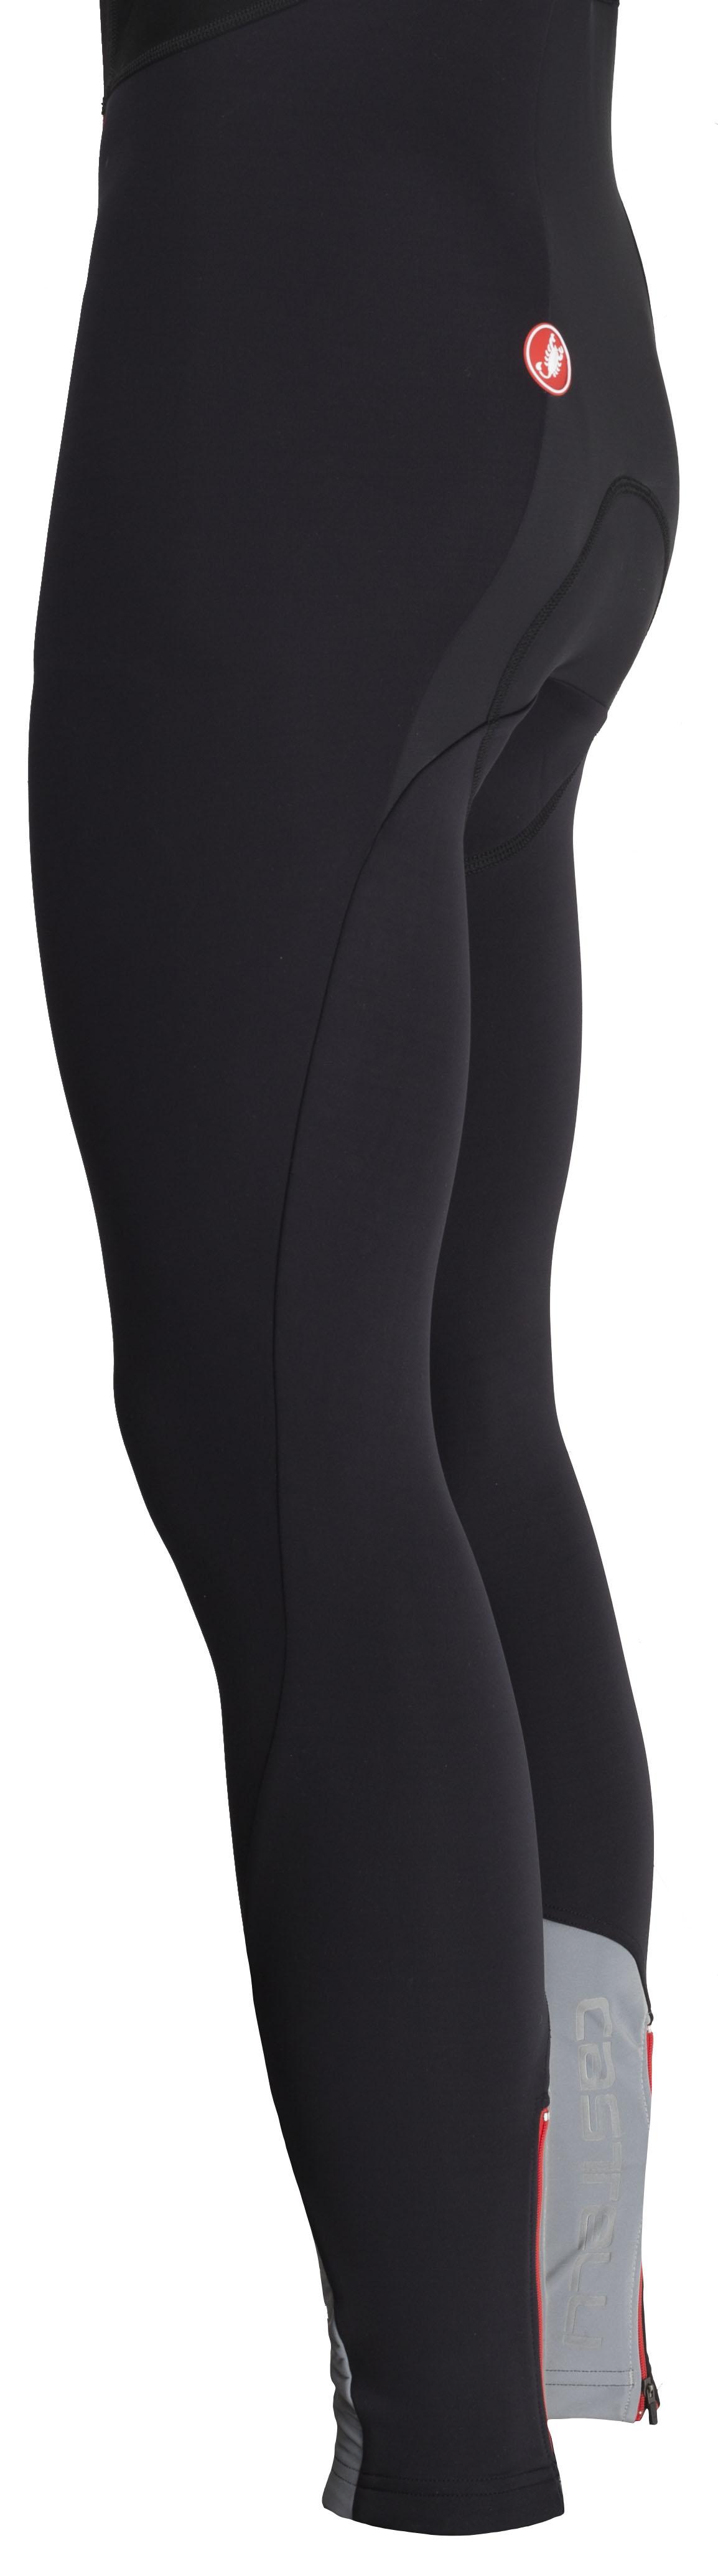 2e9719eed7b Nano Flex Pro 2 Bibtights.     Men s Bib Shorts · Castelli